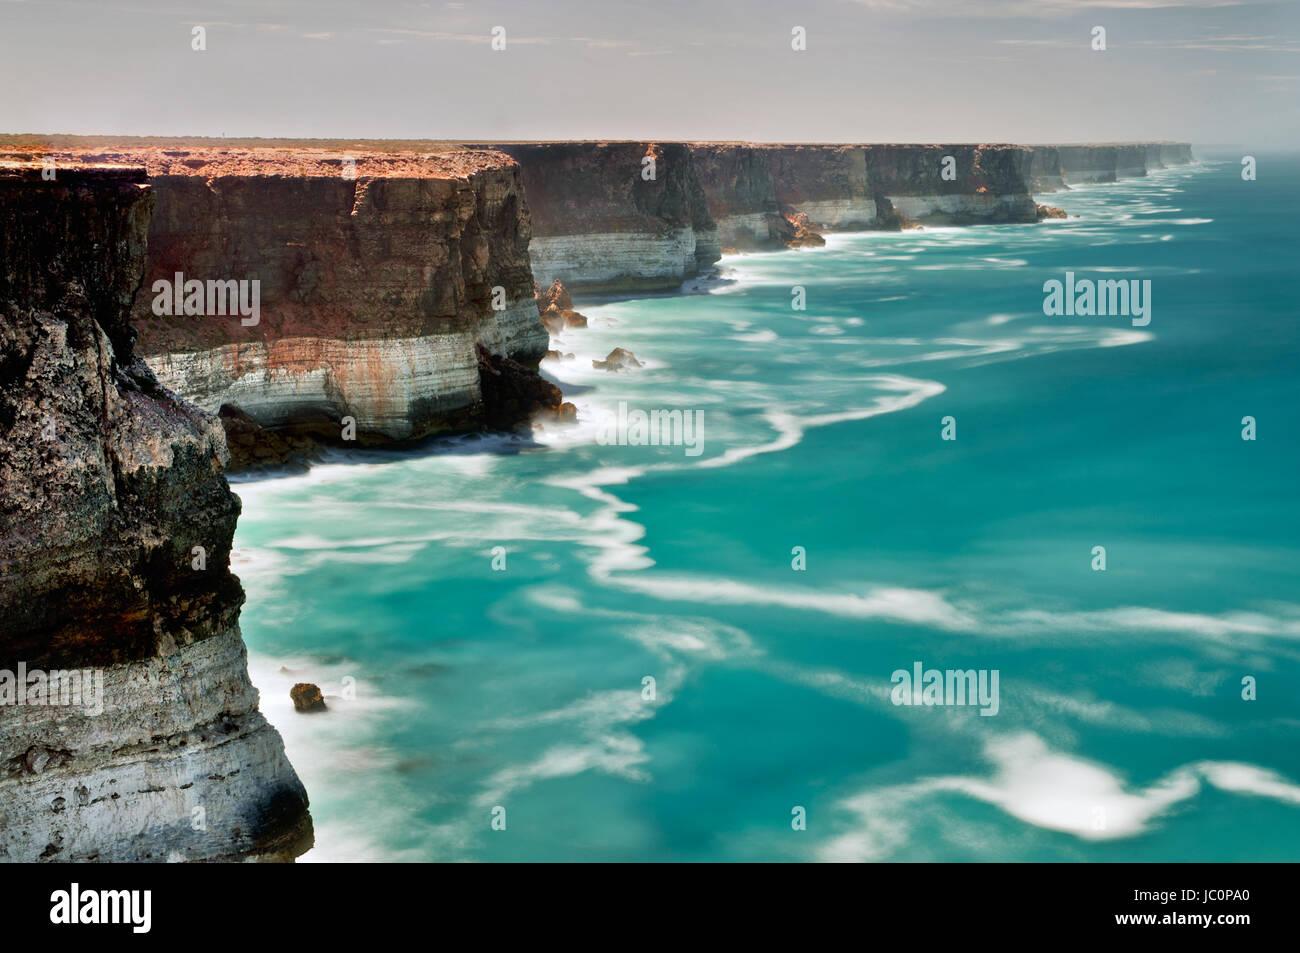 Majestic Bunda Cliffs on the edge of the Great Australian Bight. - Stock Image